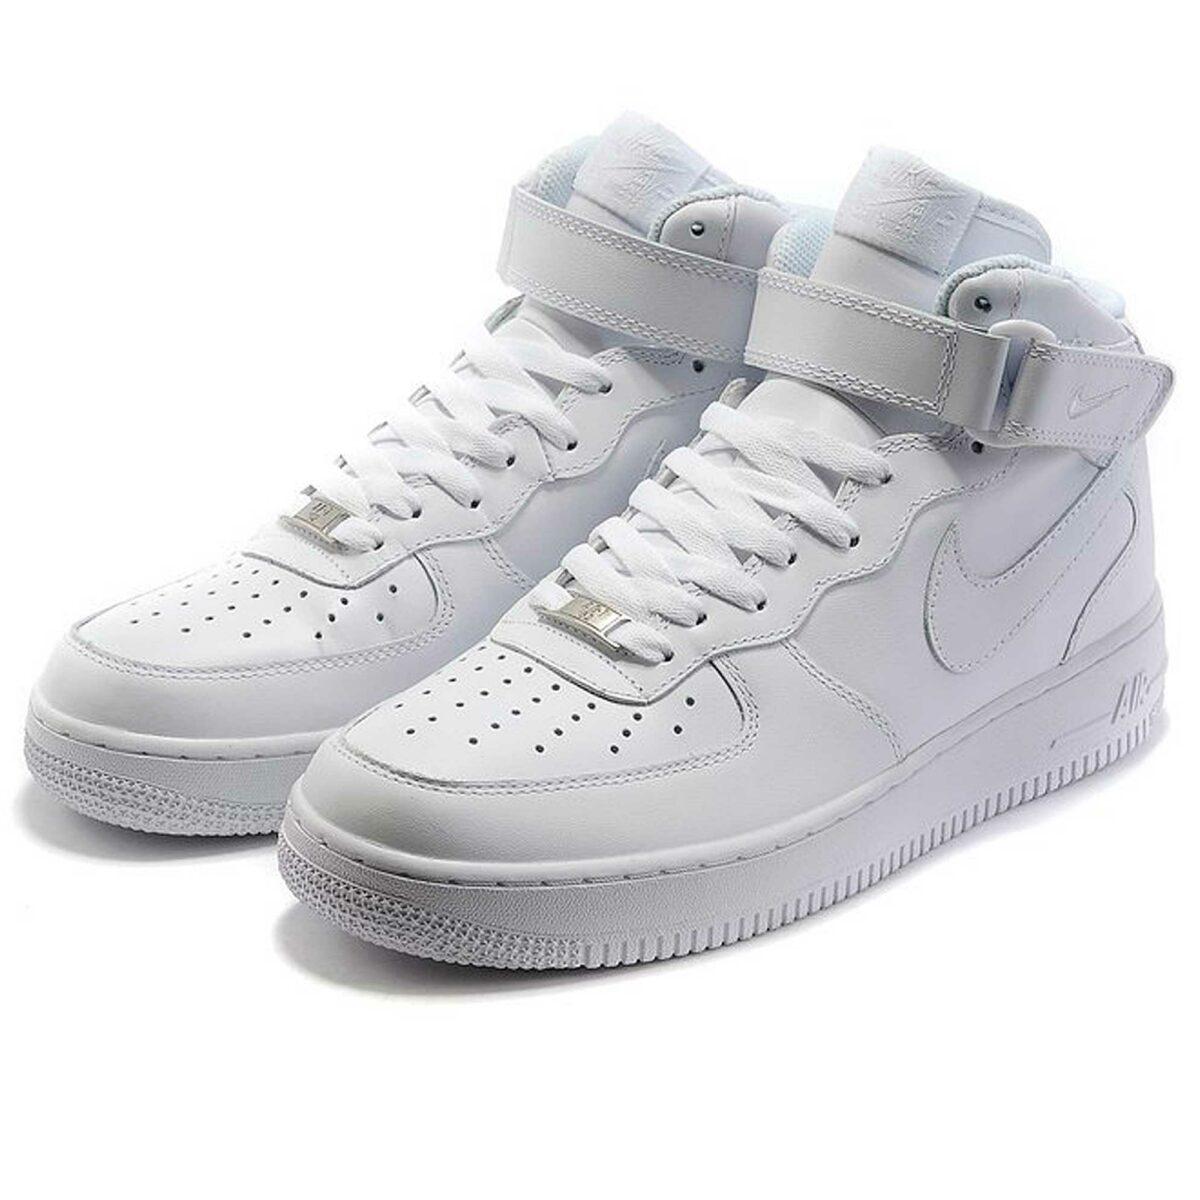 nike air force 1 mid 07 white 315123-111 купить